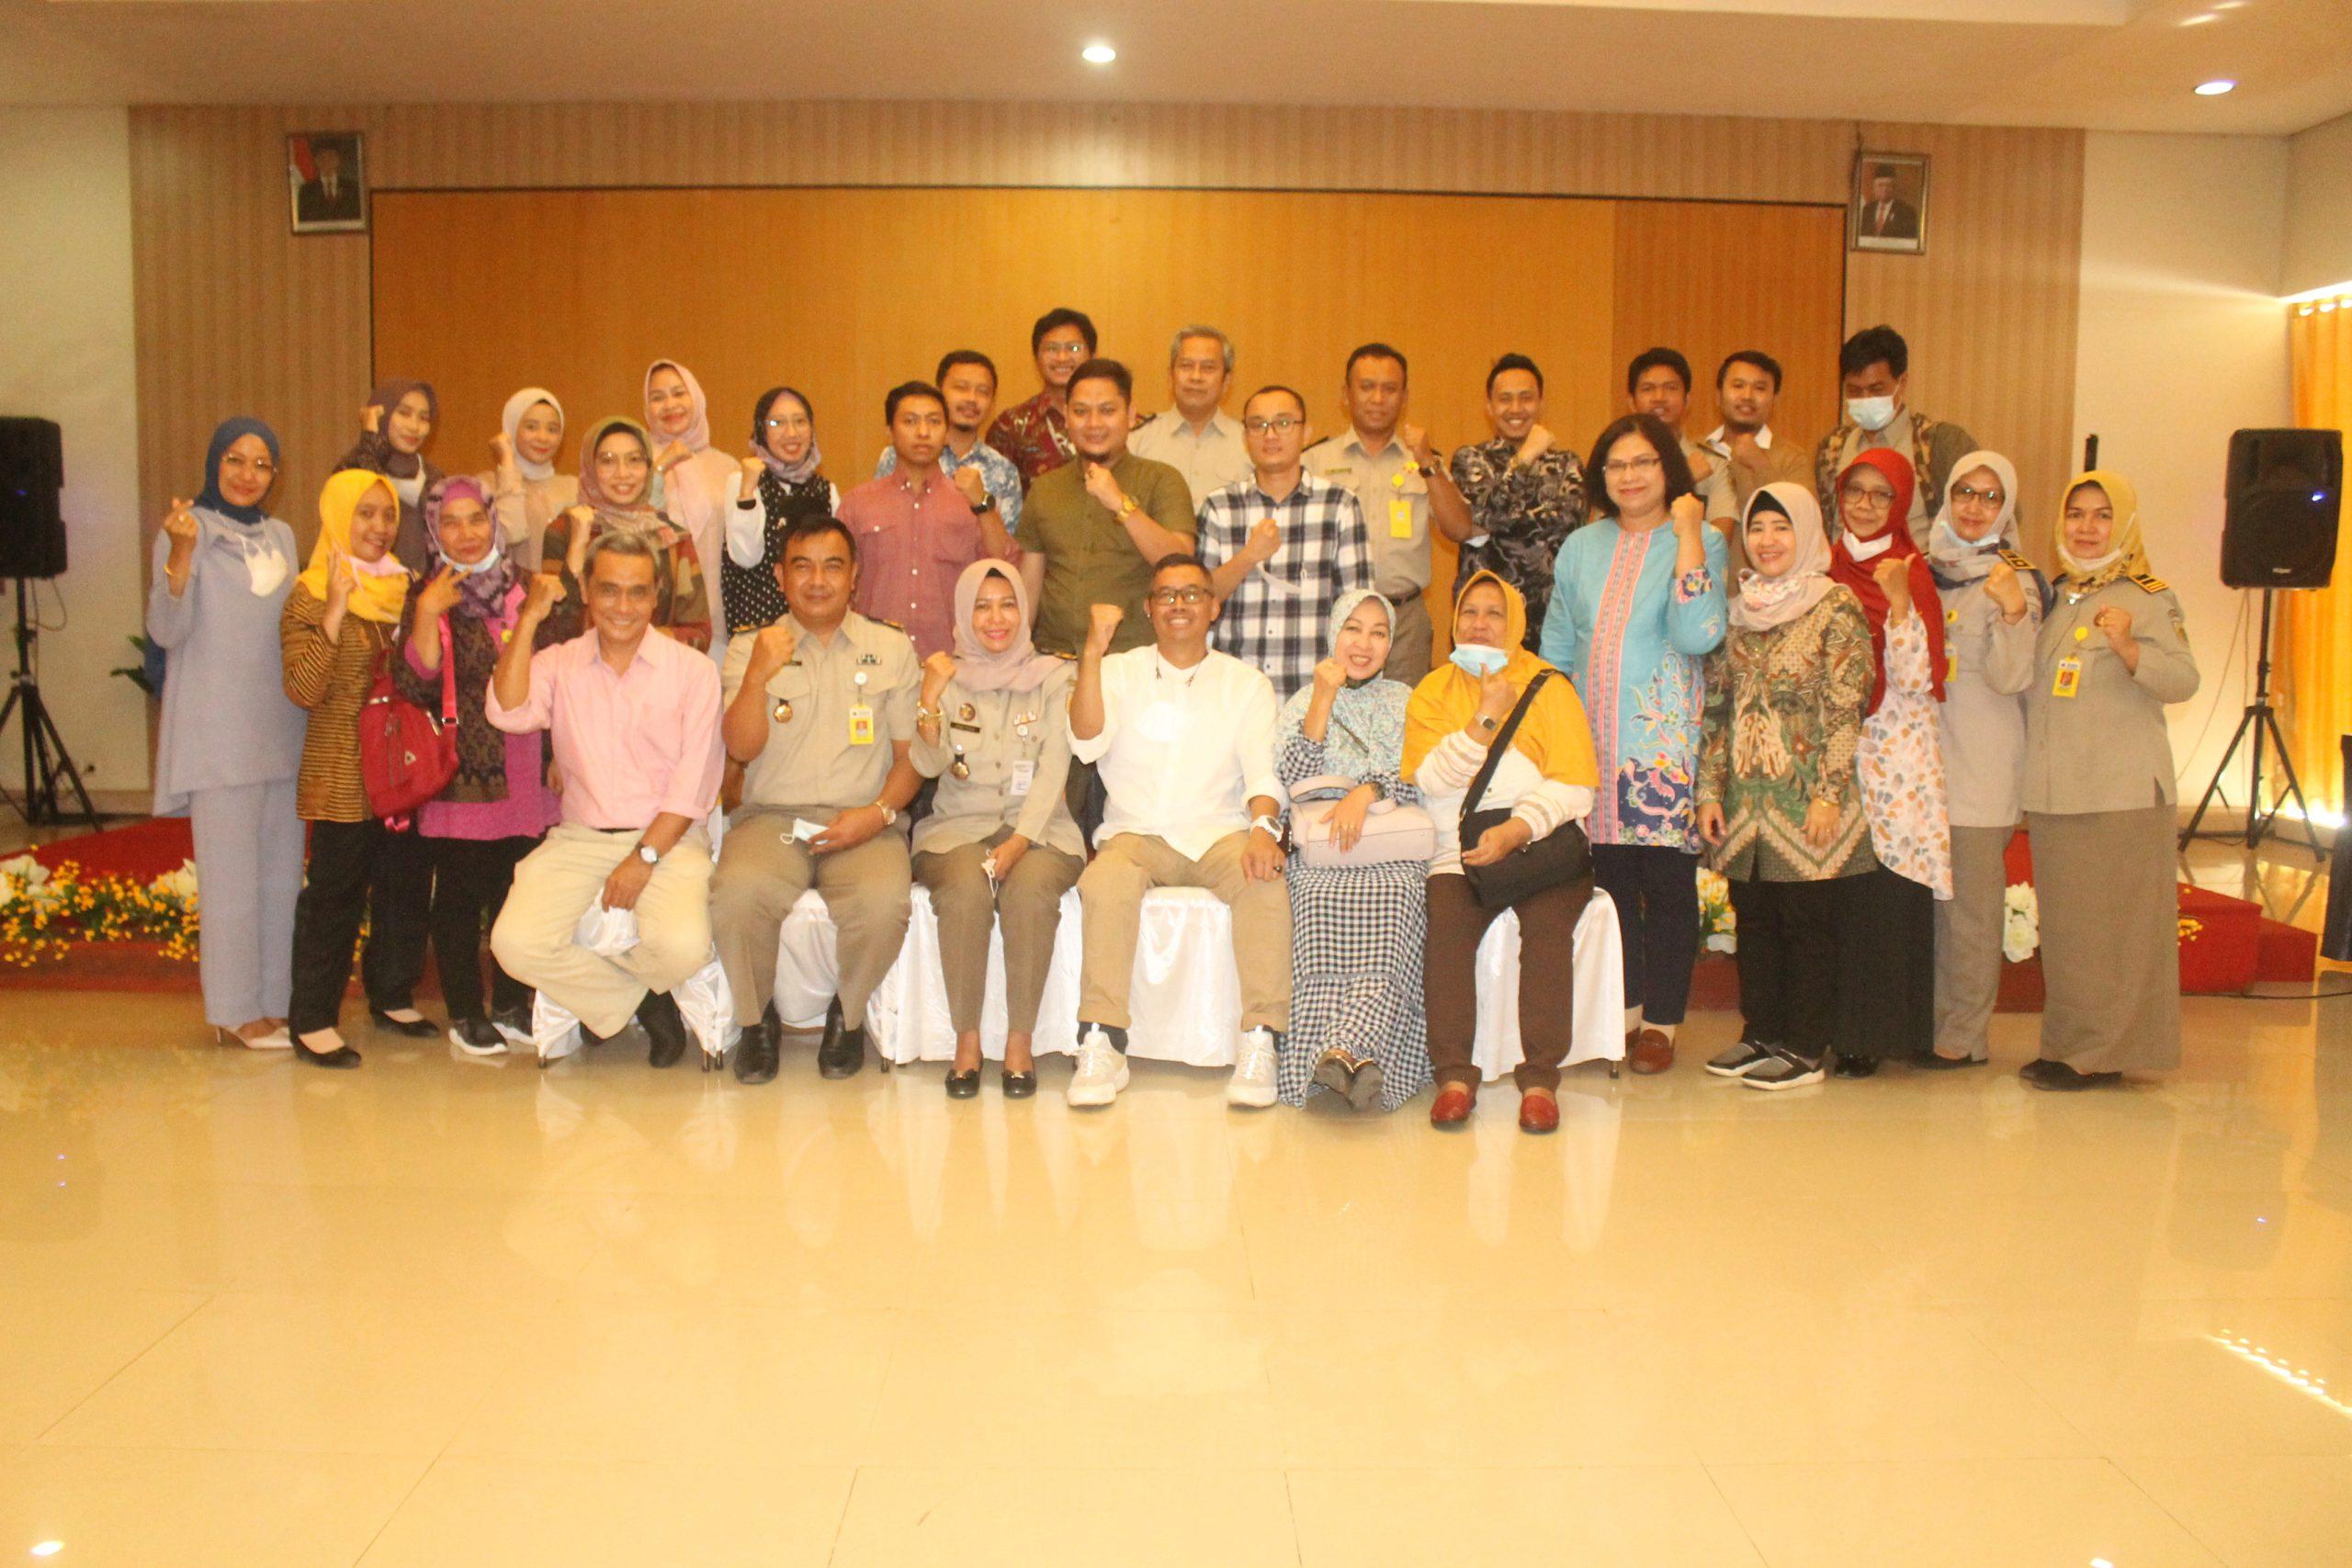 Keluarga Besar Pengda INI - IPPAT Kabupaten Pemalang Foto Bersama Jajaran Kantor ATR/BPN Pemalang, Bapenda Pemalang dan KPP Pratama di acara Halal Bihalal di hotel Regina pada Selasa (8/6/2021) lalu